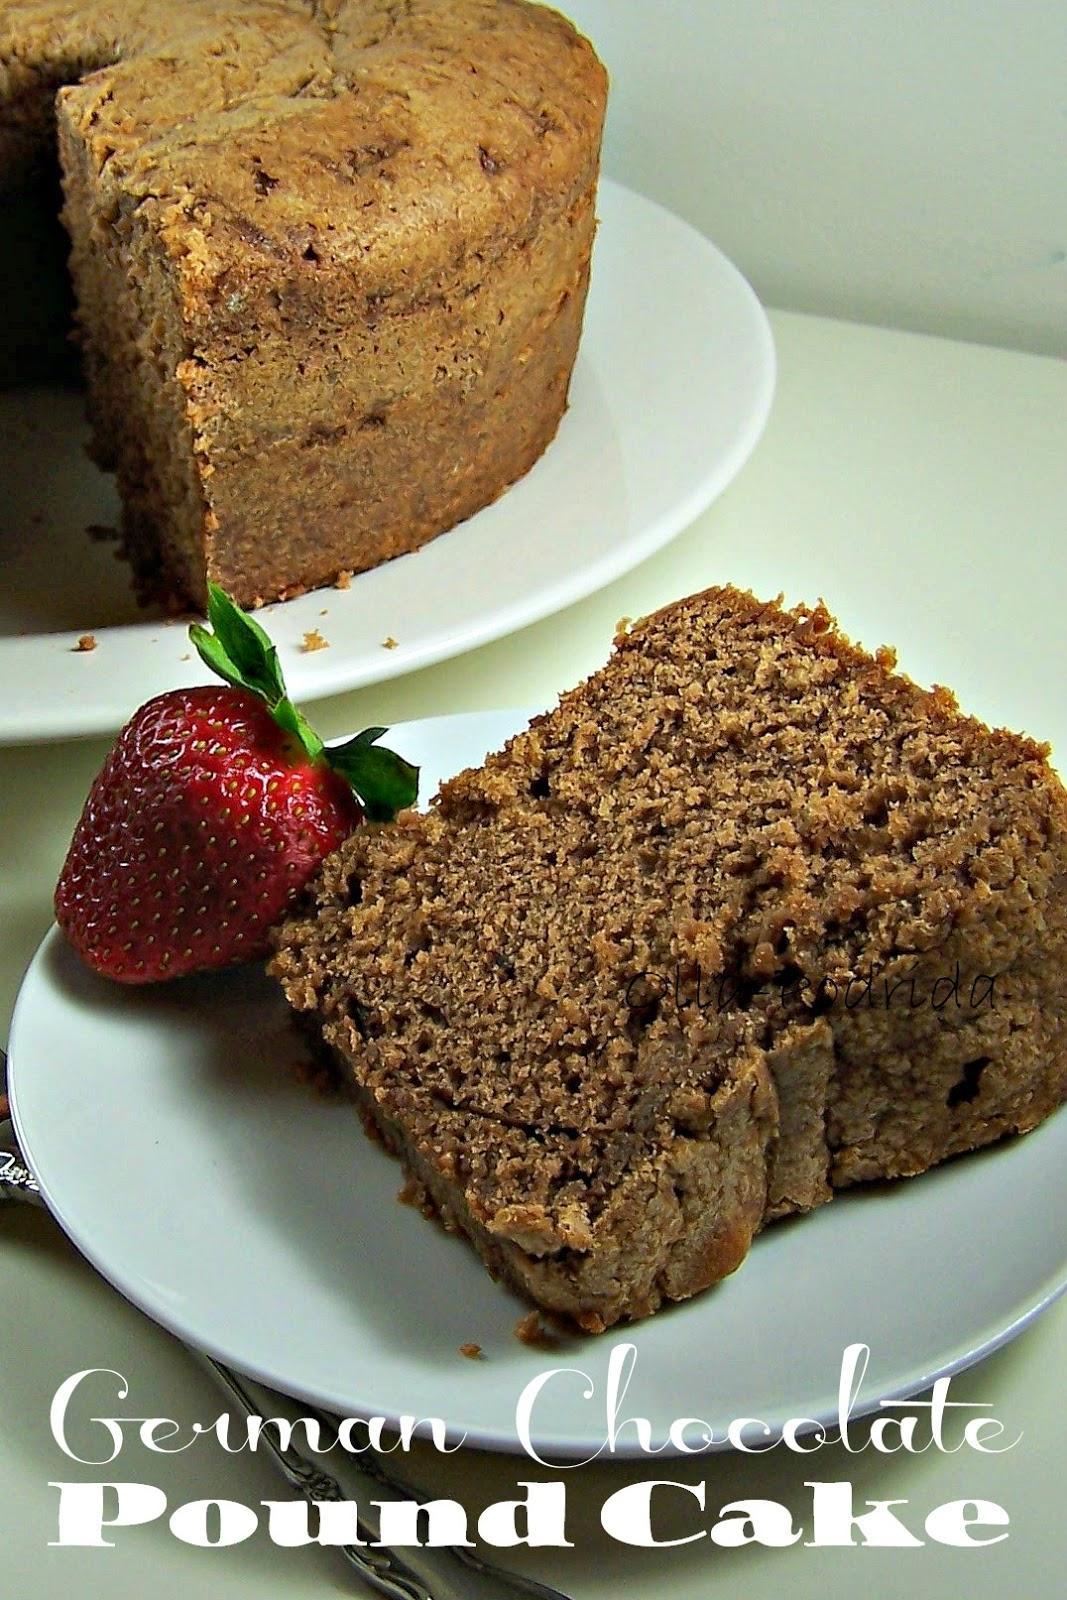 Olla Podrida German Chocolate Pound Cake